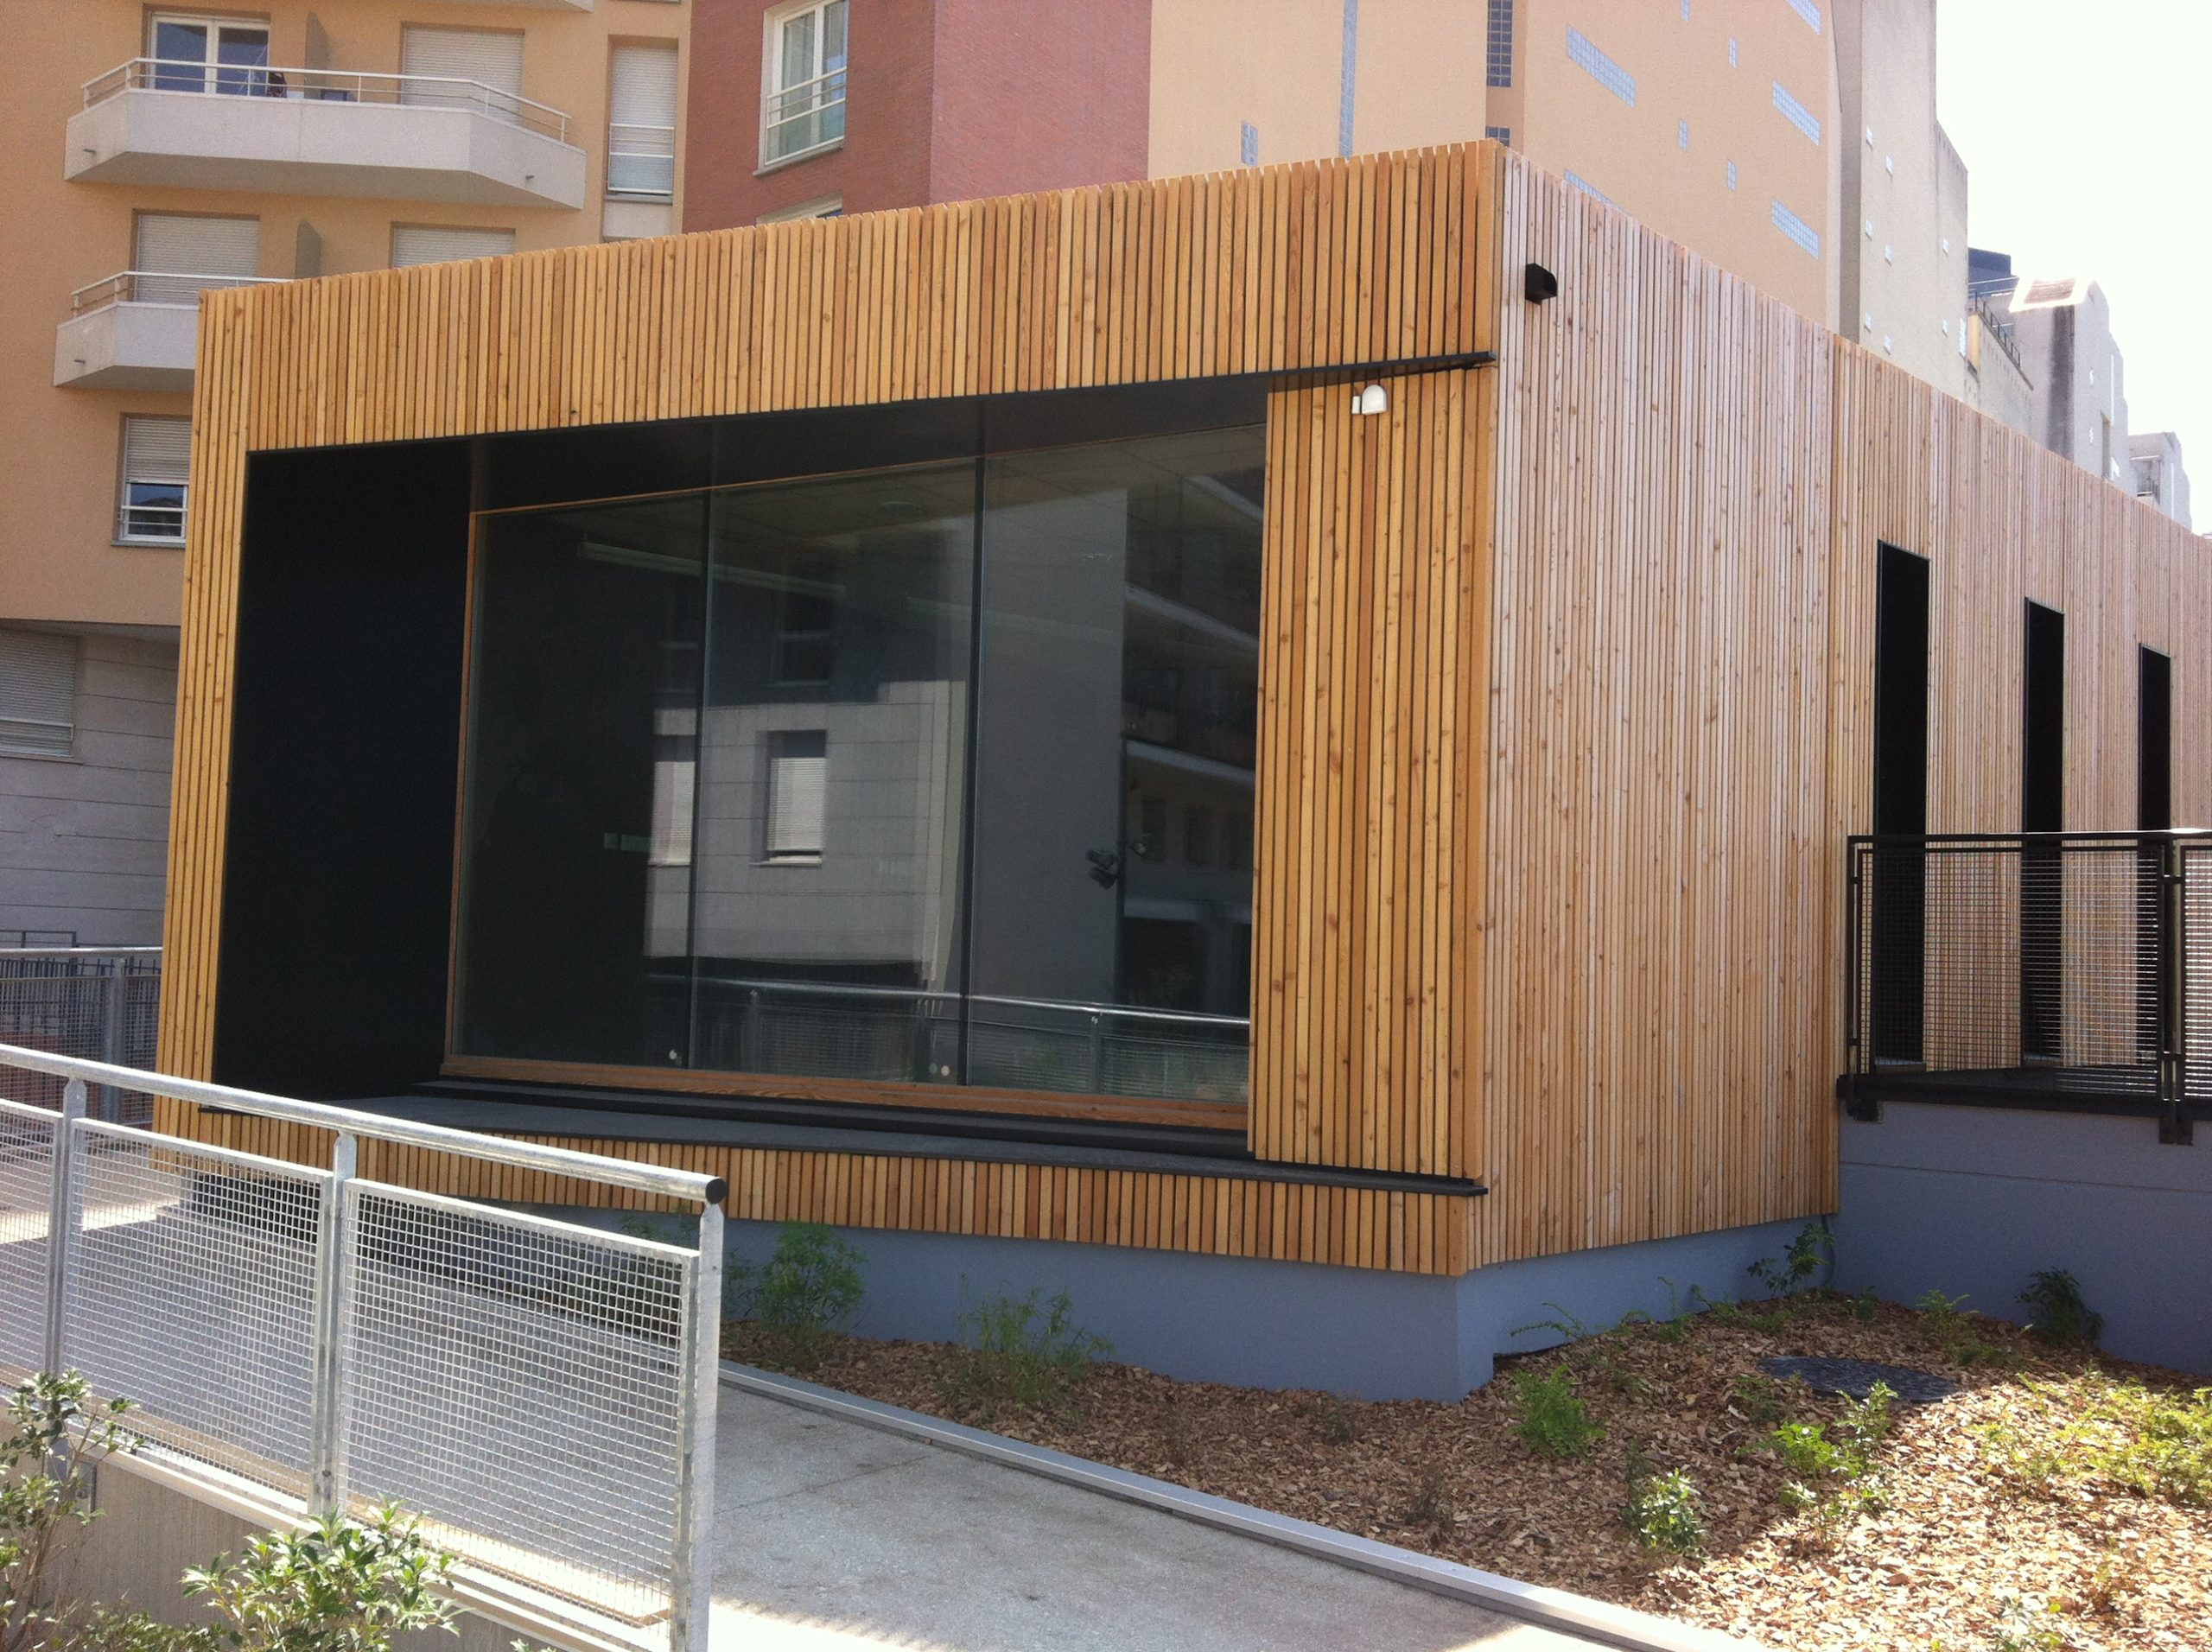 Bâtiment en façade bois